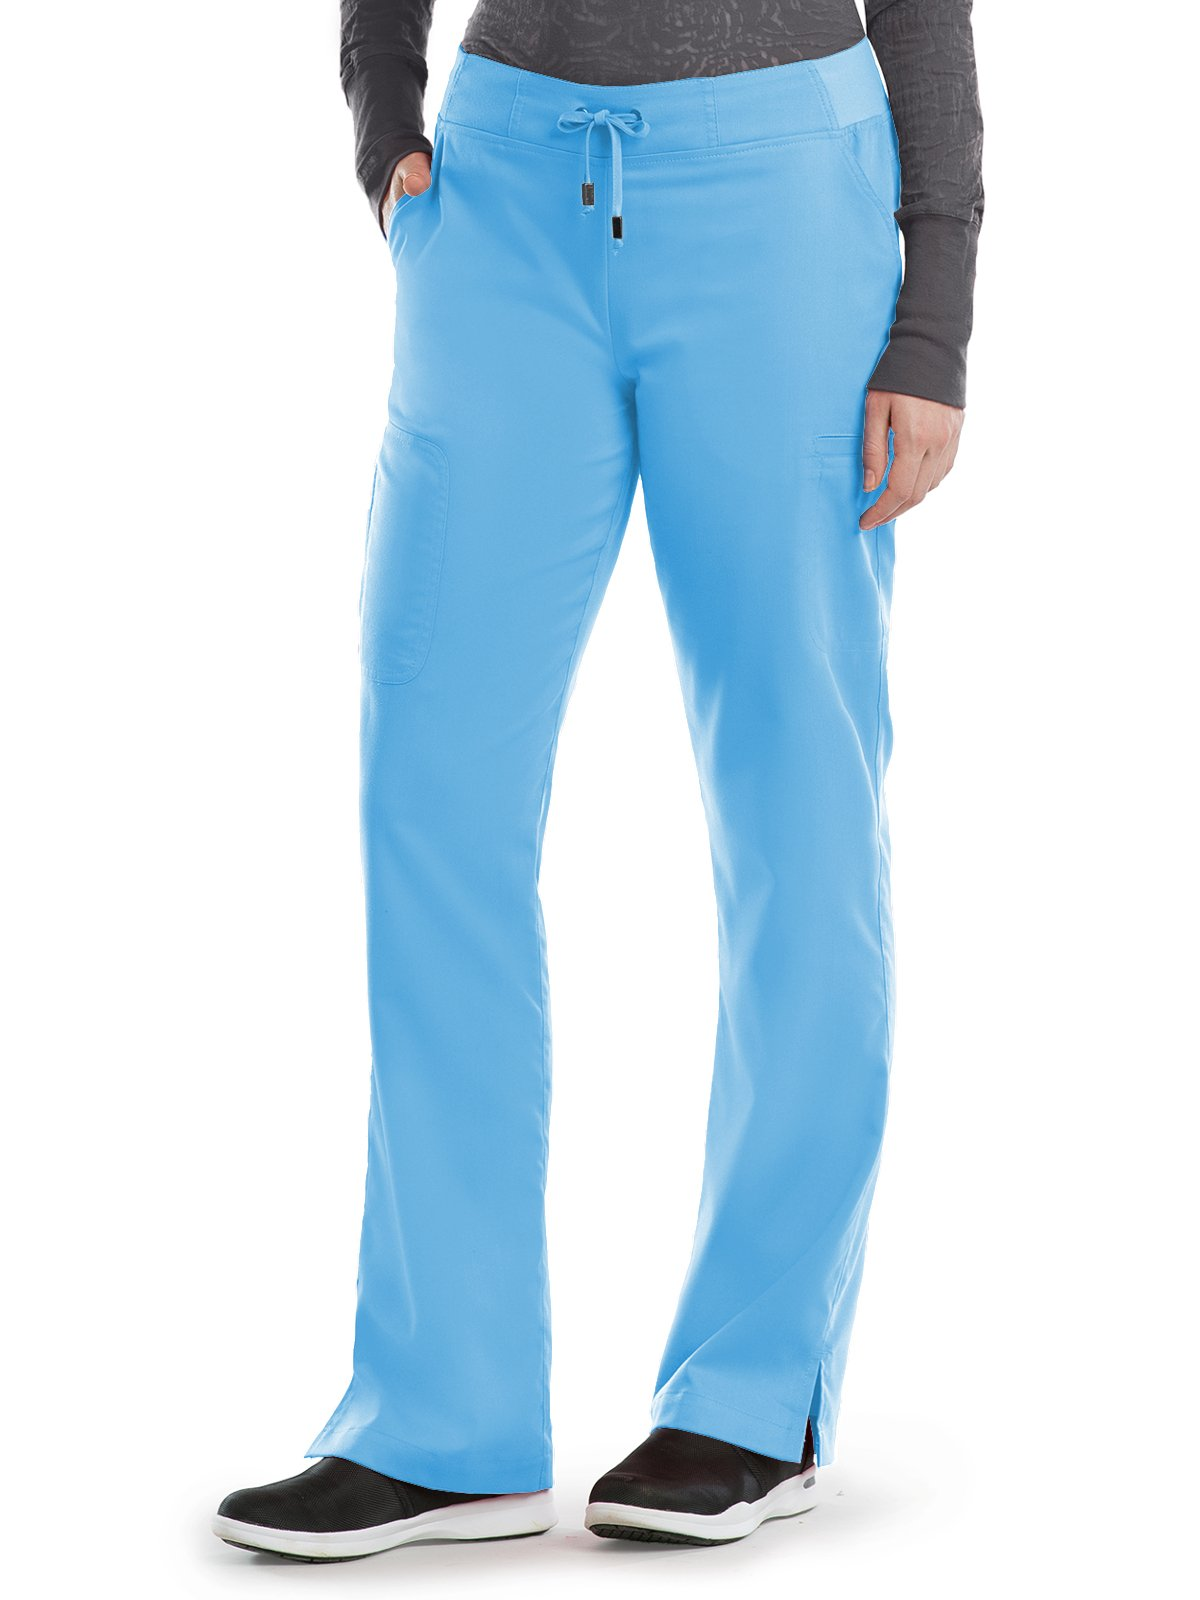 Grey's Anatomy 4277 Straight Leg Pant Ice Berg S Tall